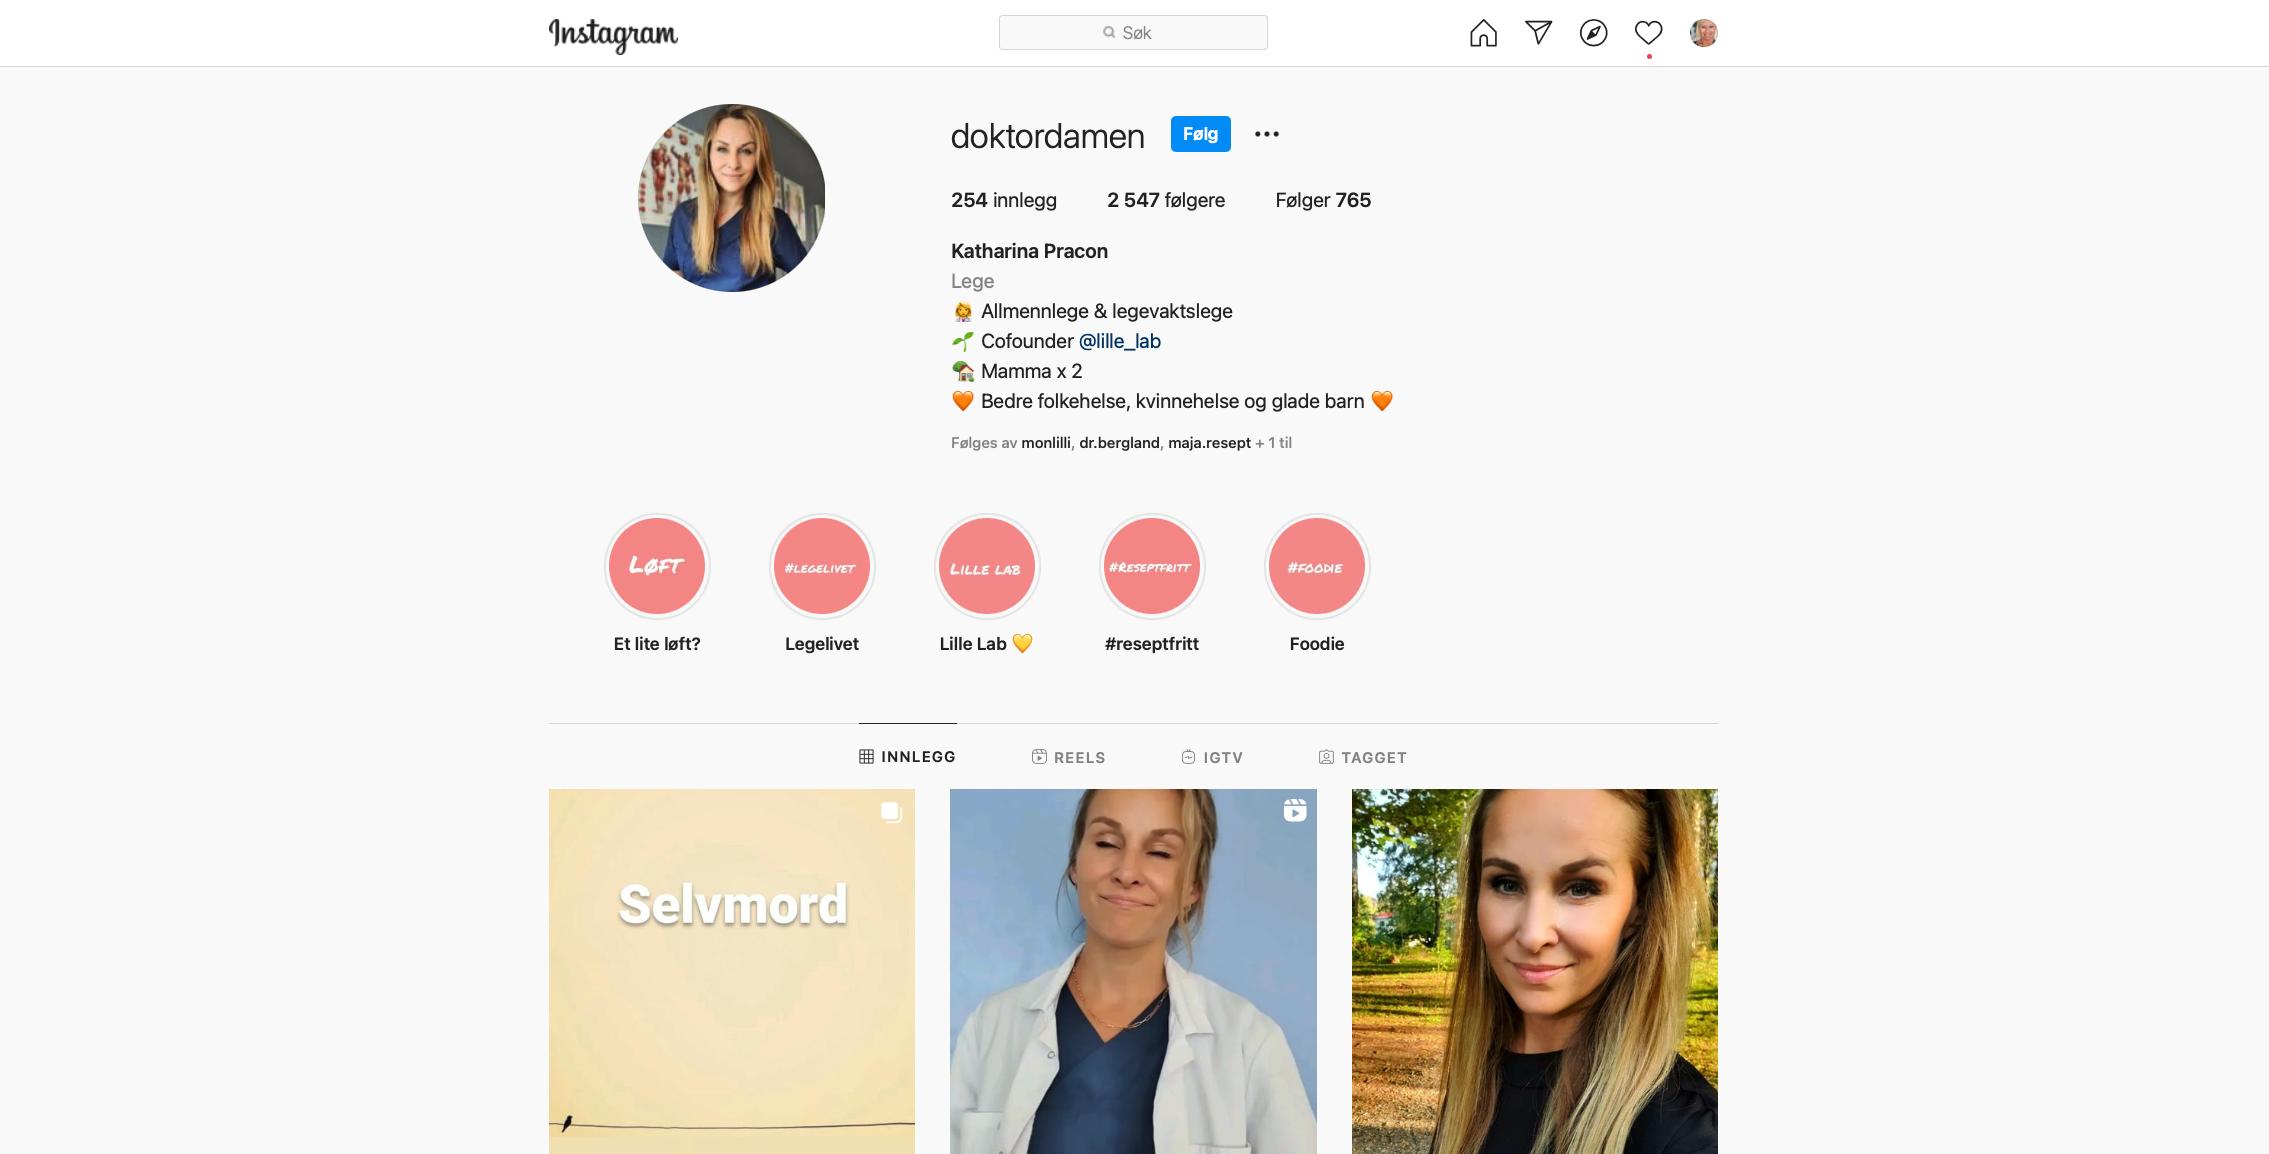 Katharina-Pracon-instagram-doktordamen-2